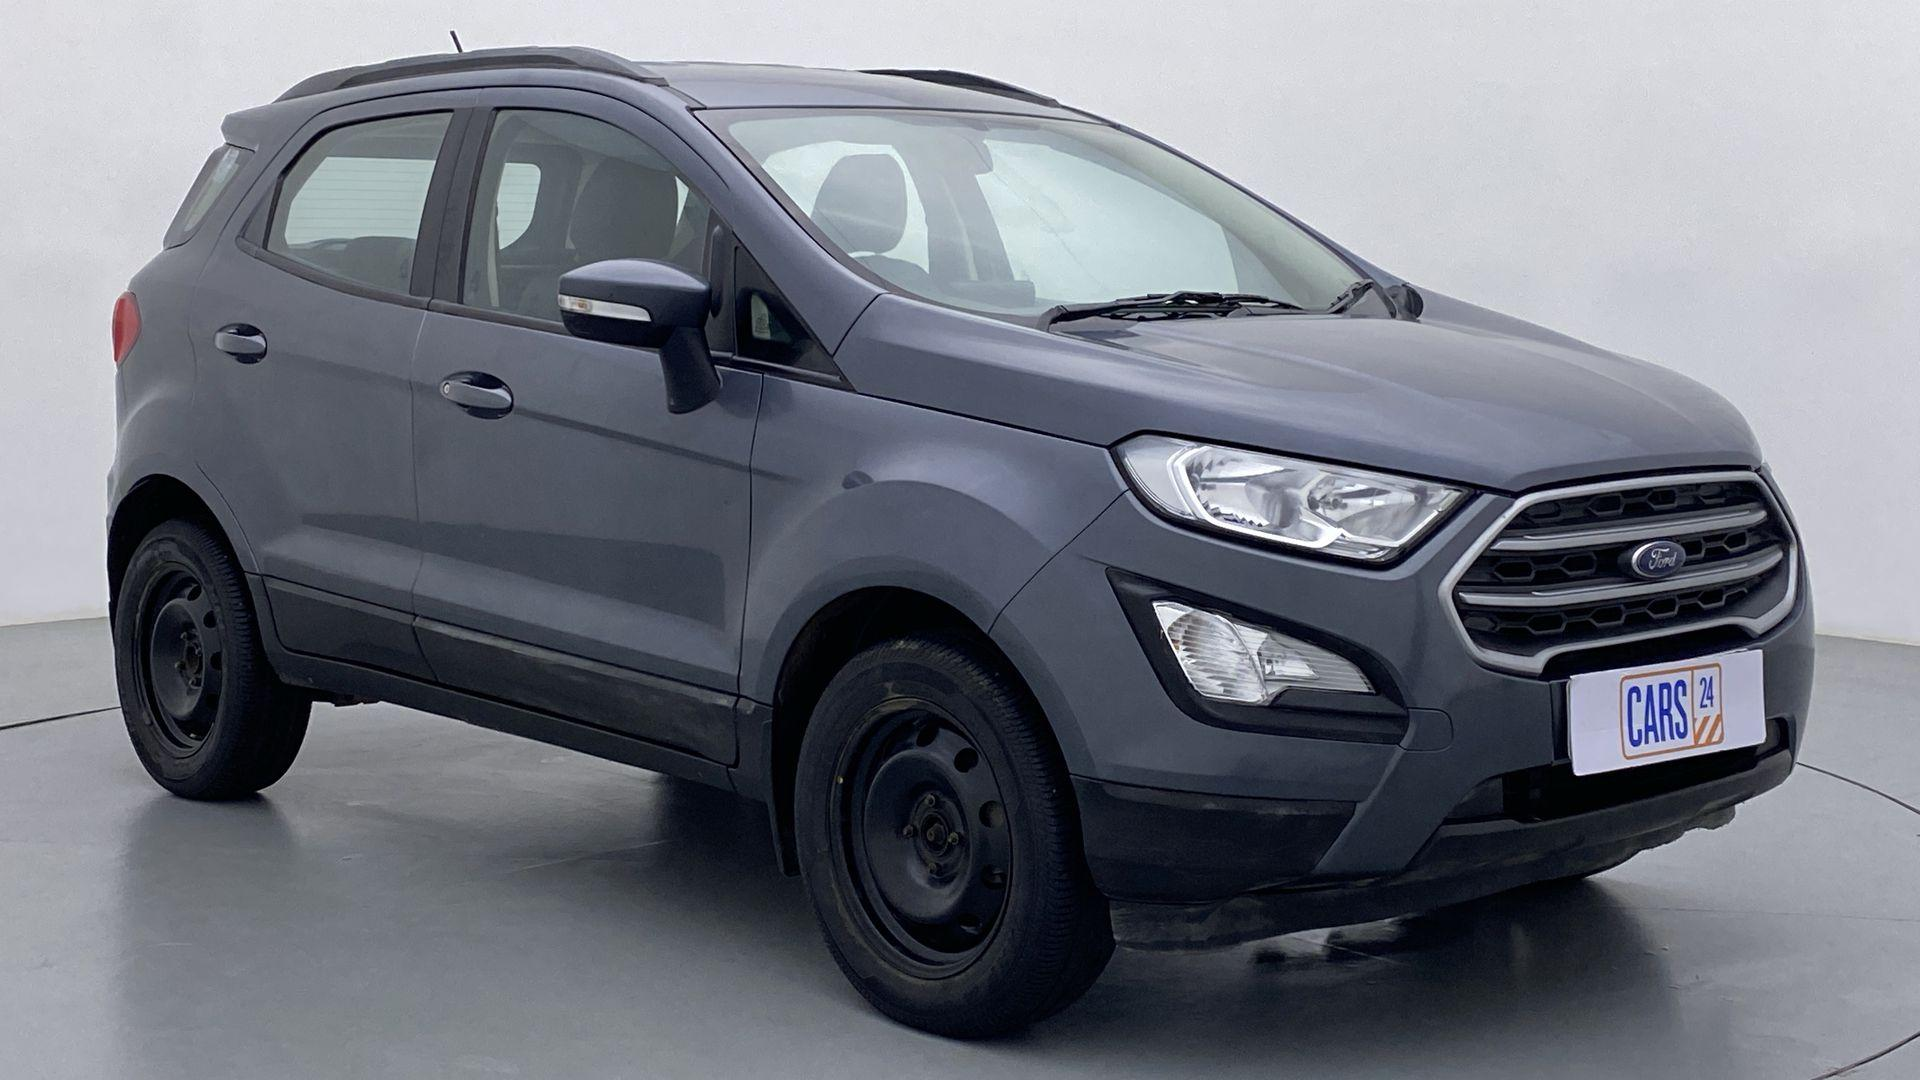 2019 Ford Ecosport 1.5 TREND+ TDCI